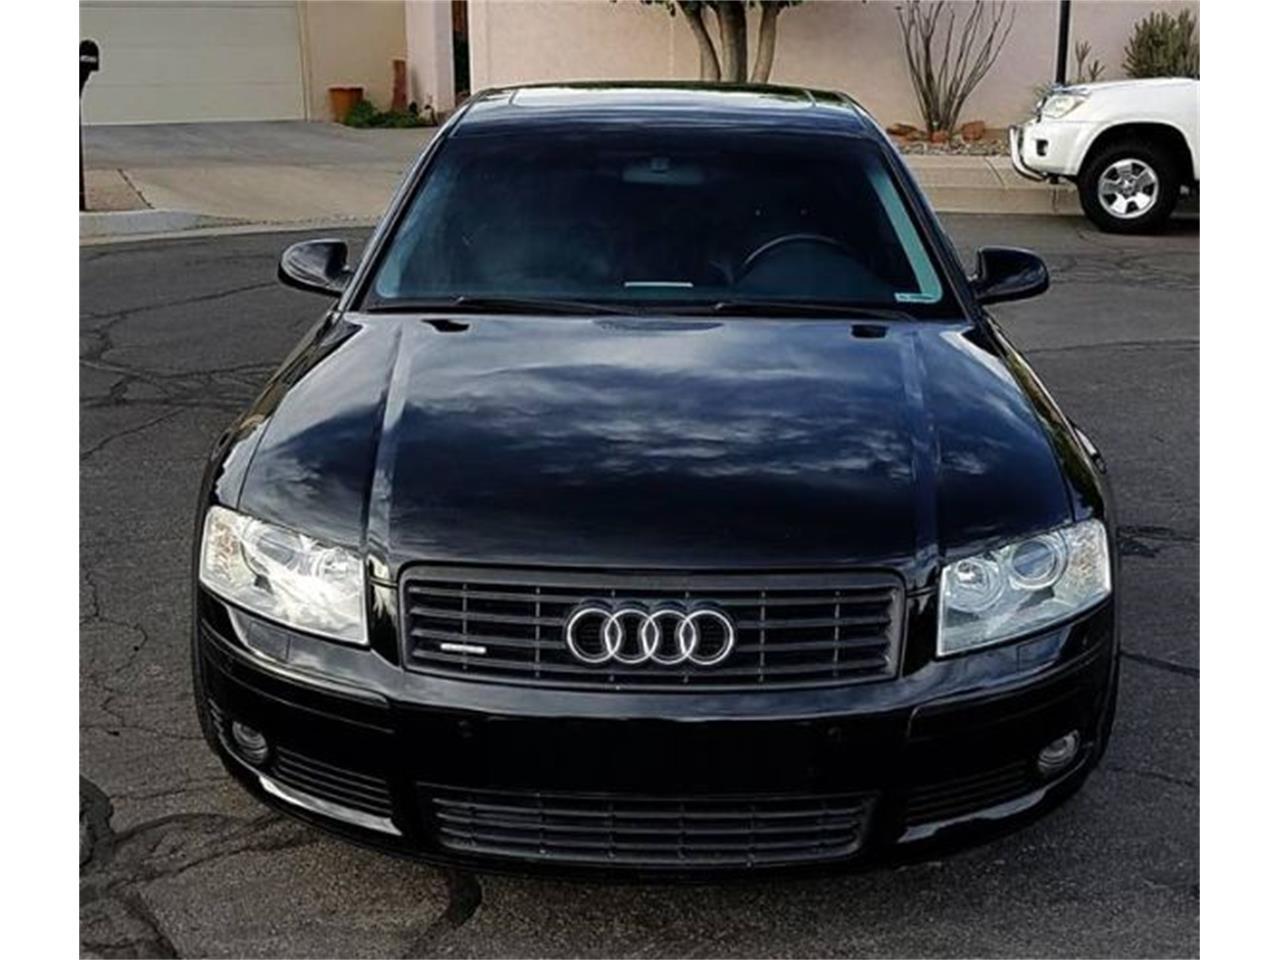 Large Picture of '05 Audi A8 located in Michigan - O4UQ